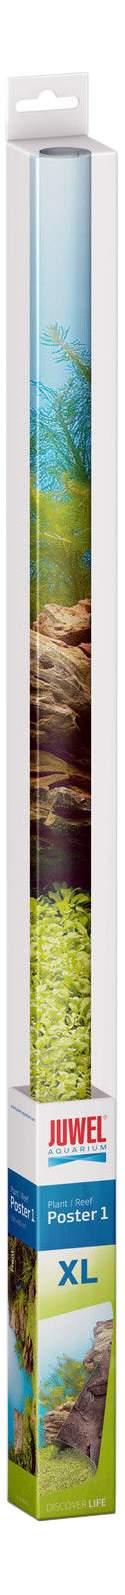 Фон для аквариума JUWEL Poster 1 XL 86270